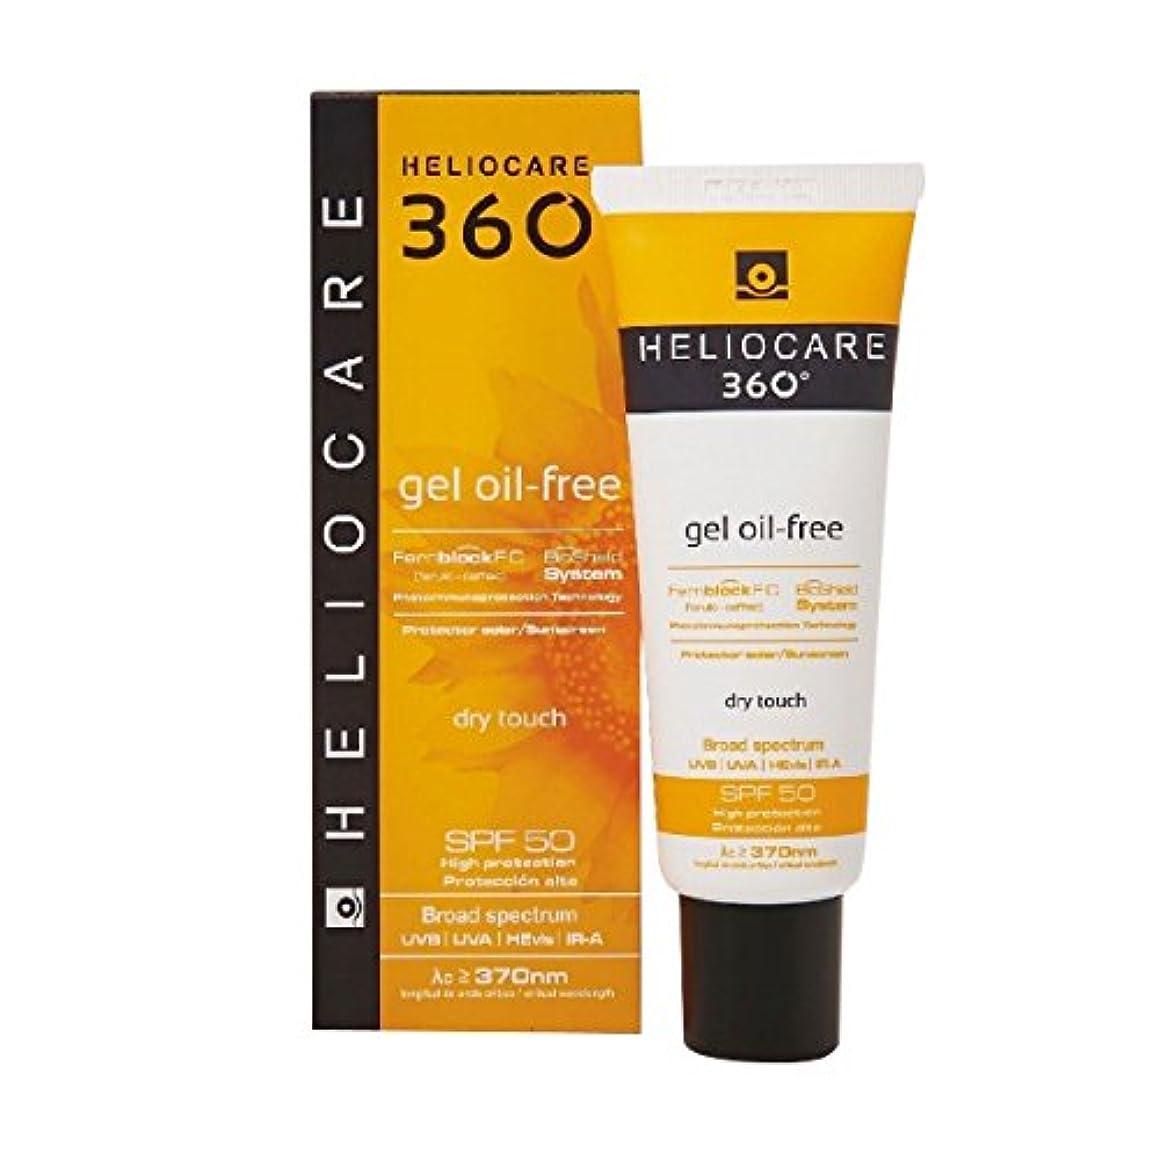 住所土器鉛Heliocare 360 Gel Oil Free Spf50 50ml [並行輸入品]